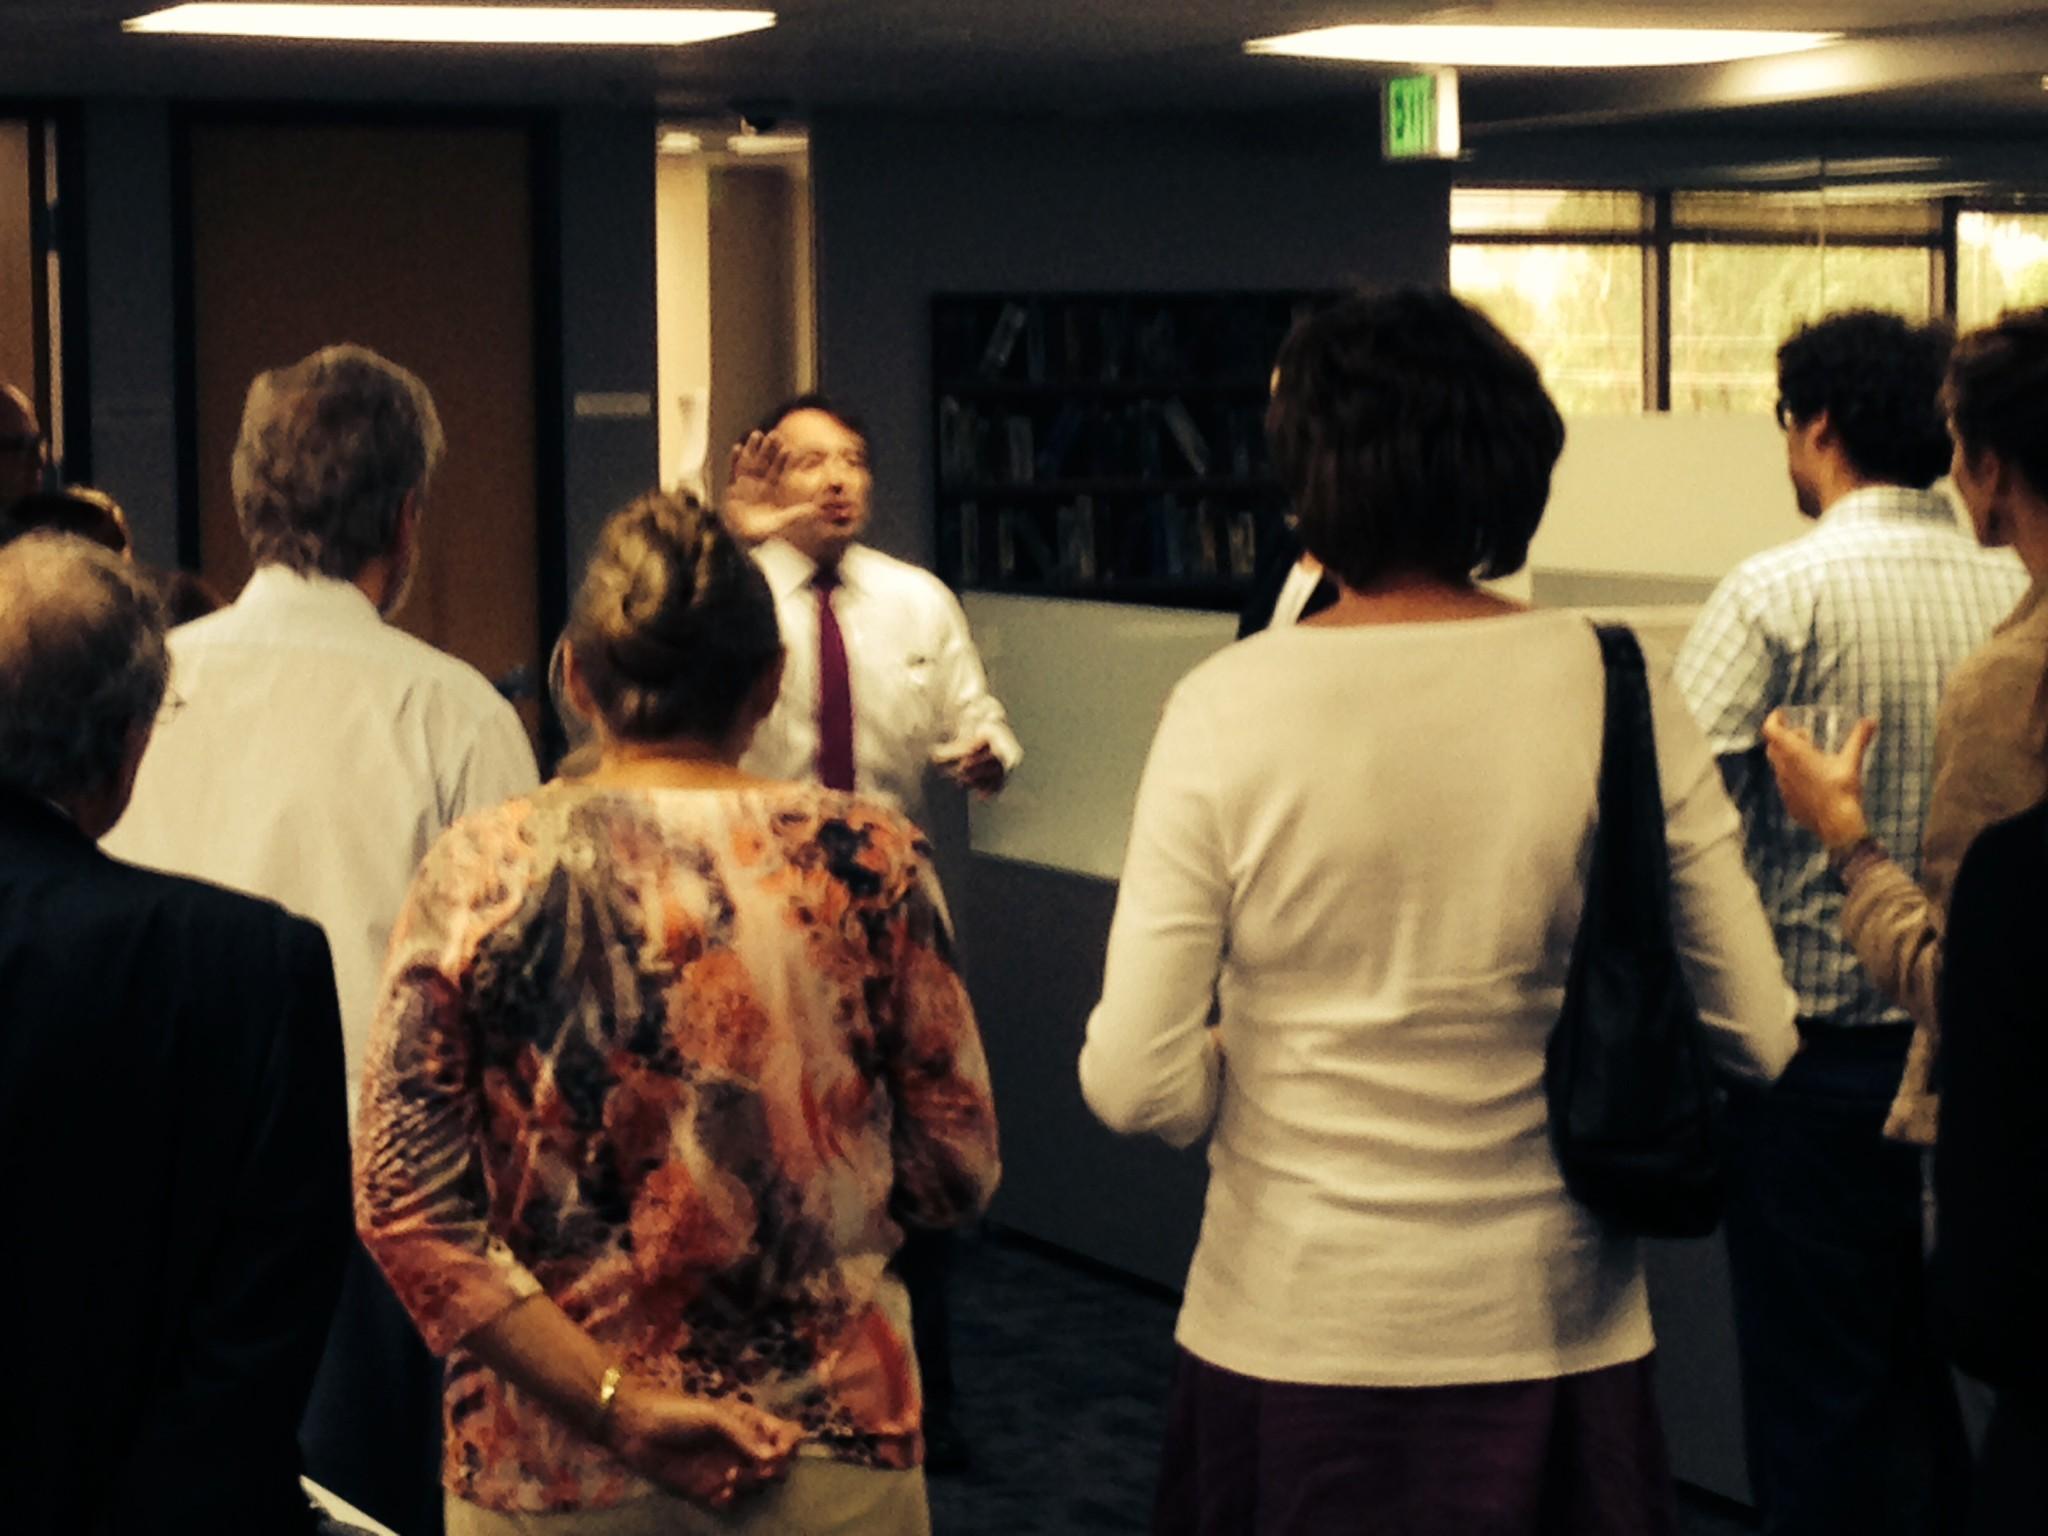 Rep. Daniel Kagan Visits LawBank to Celebrate House Bill 1032